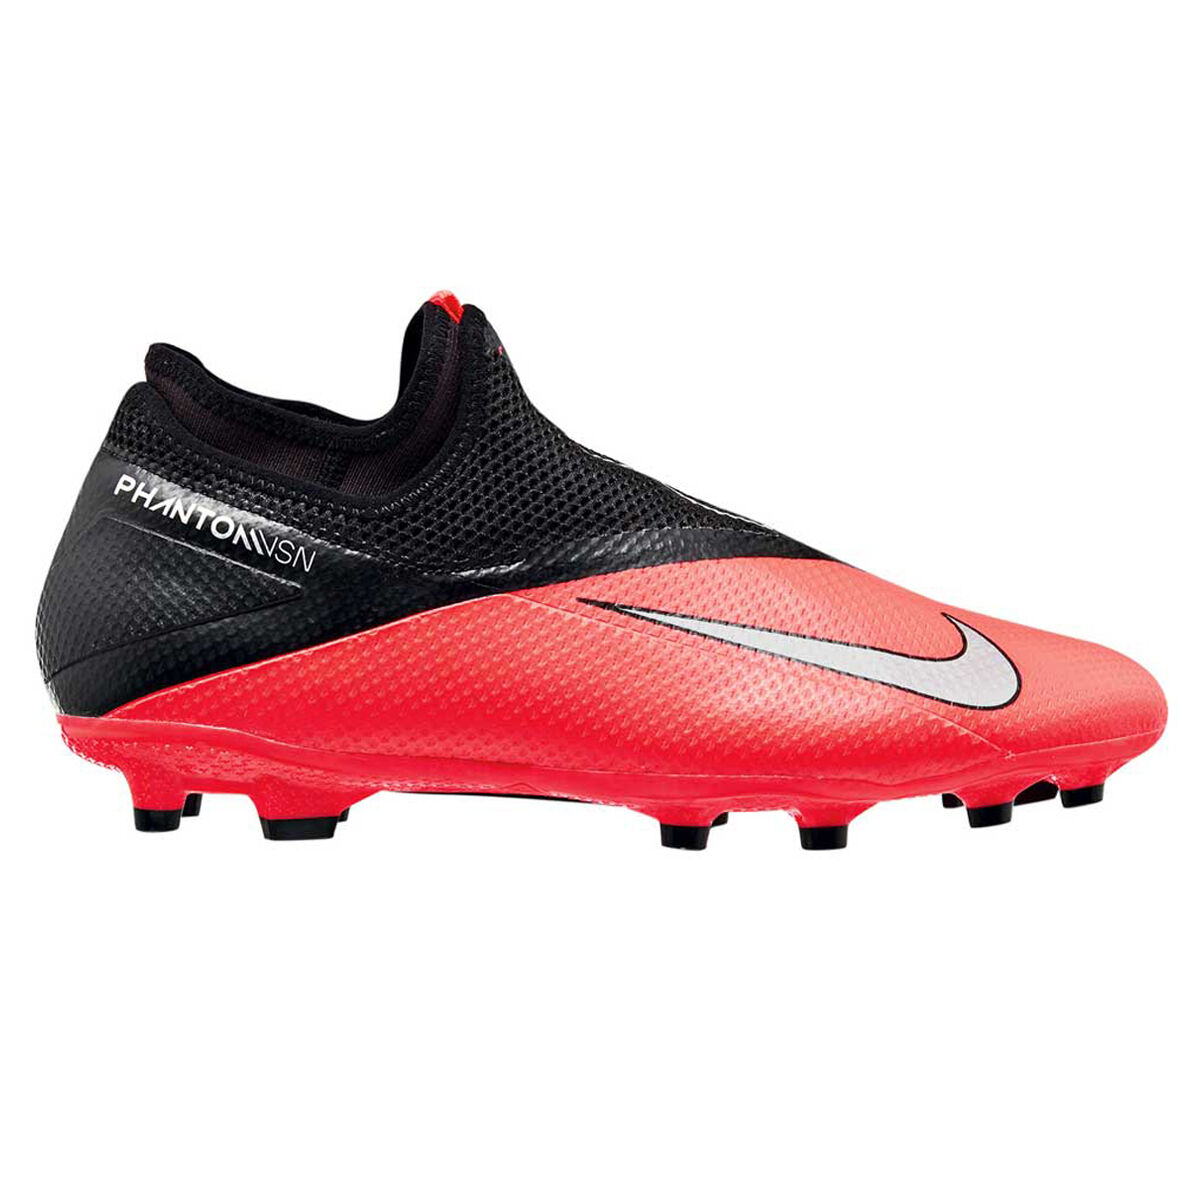 Nike Phantom Vision II Academy Football